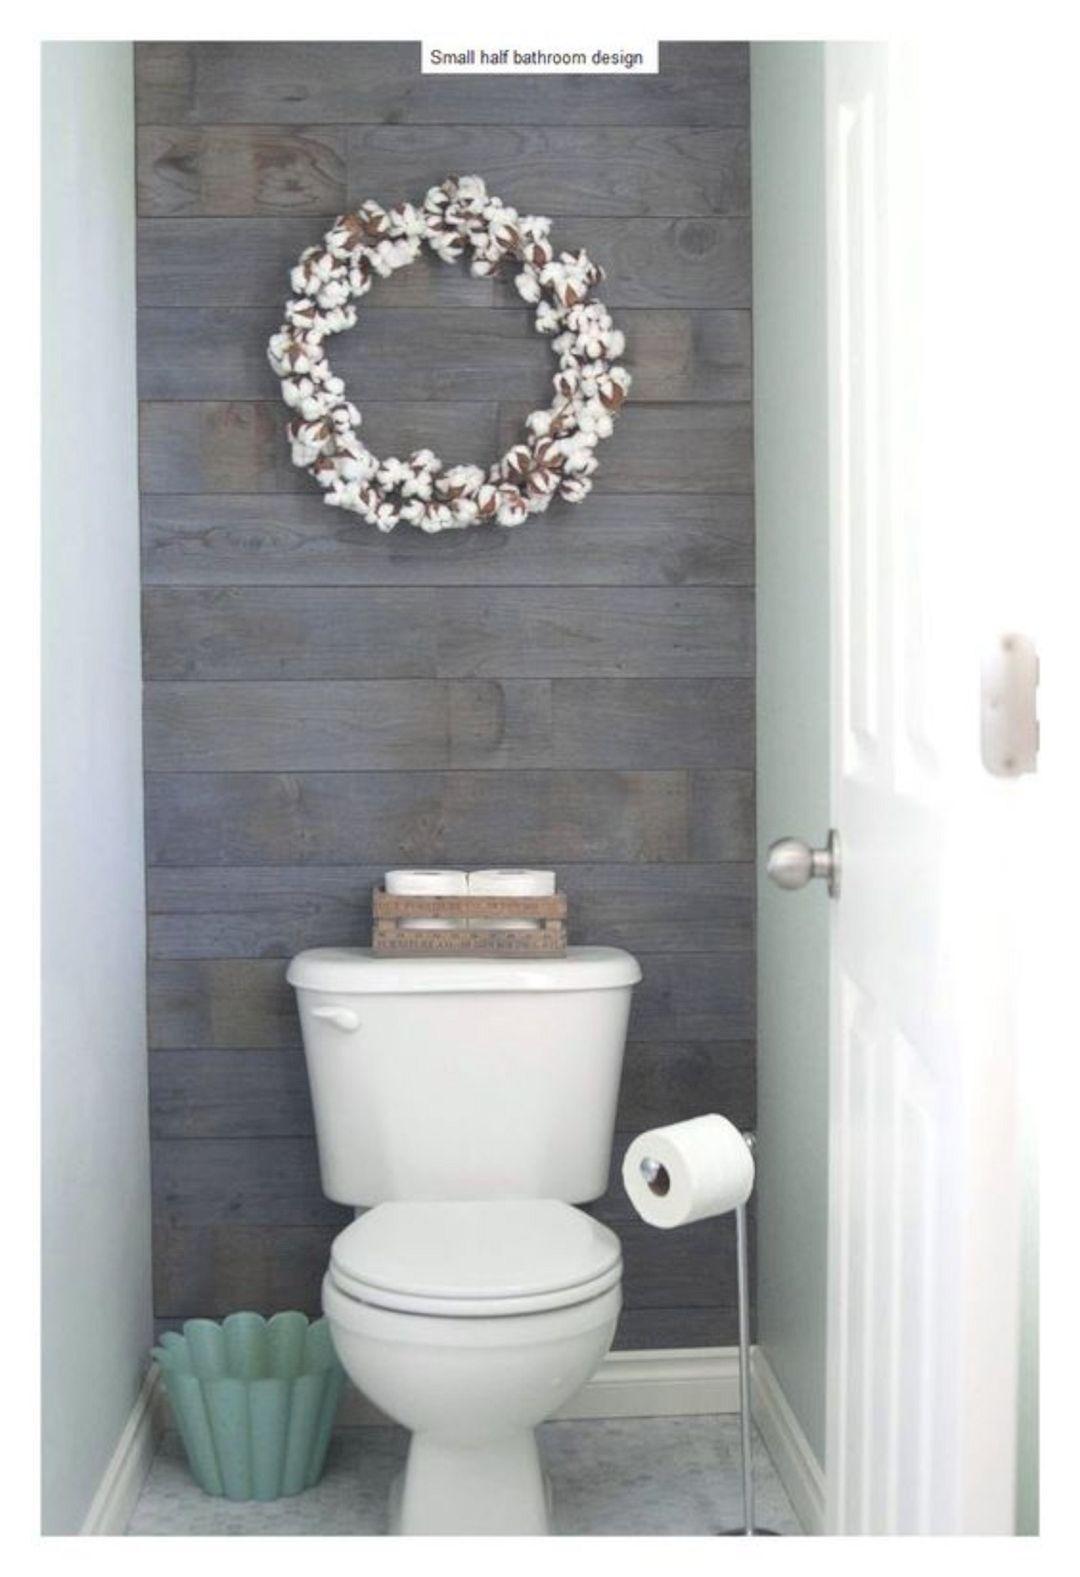 5 Awesome Small Bathroom Decorating Ideas Half Bath Remodel Bathroom Decor Bathroom Makeover